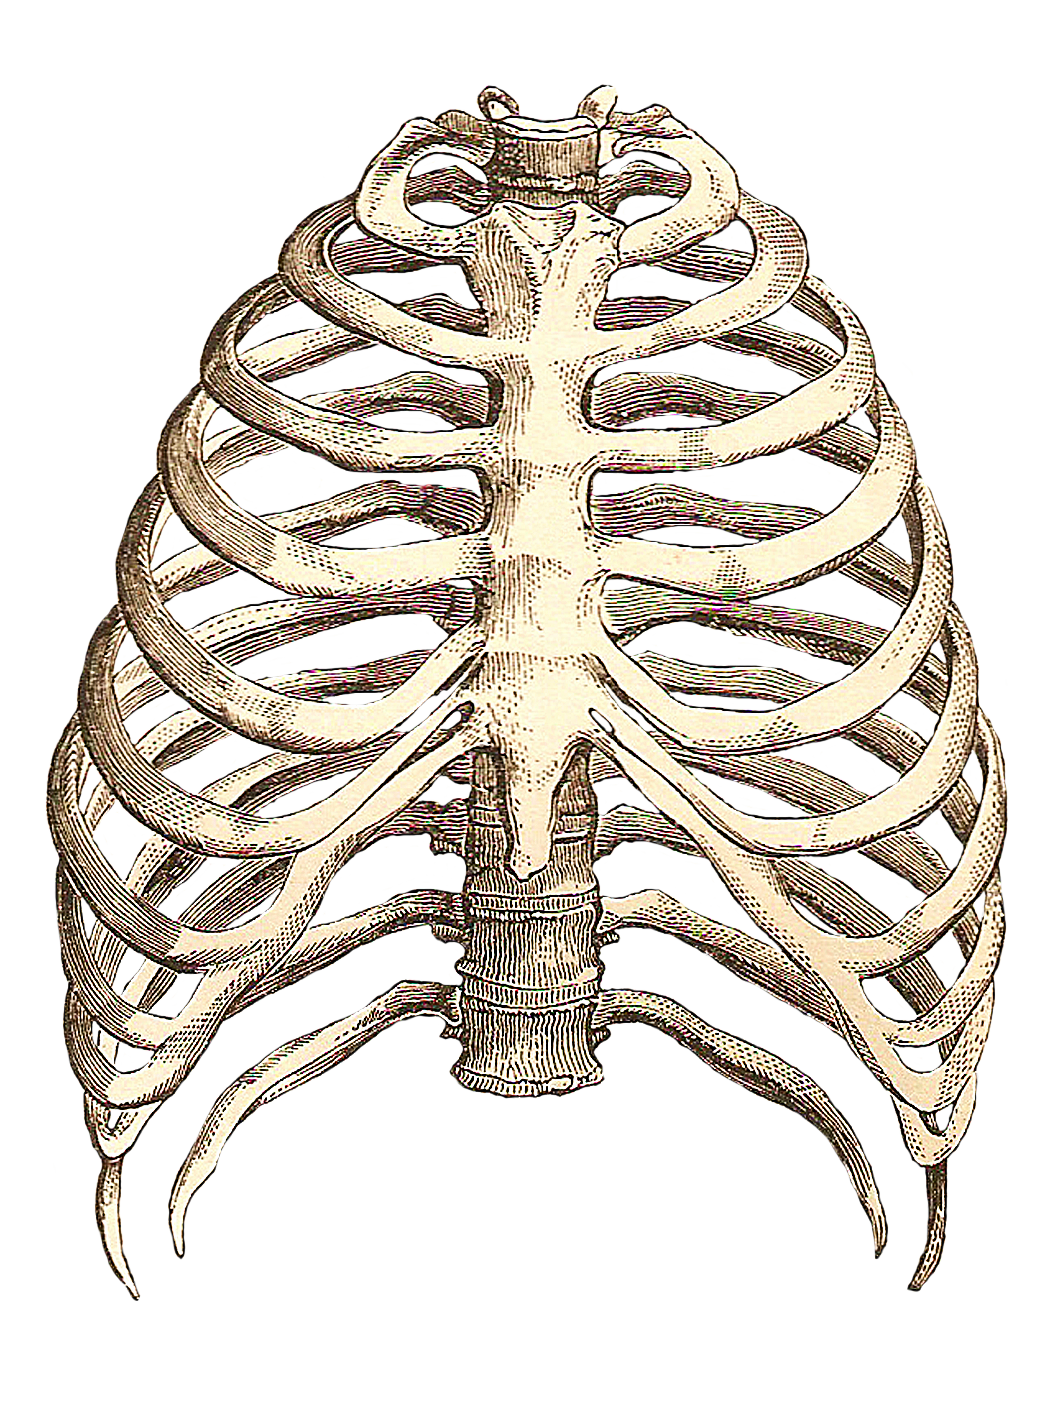 Rib Cage Drawing Art : drawing, Kanan, Nagel, Inspiration., Drawing,, Skeleton, Drawings,, Anatomy